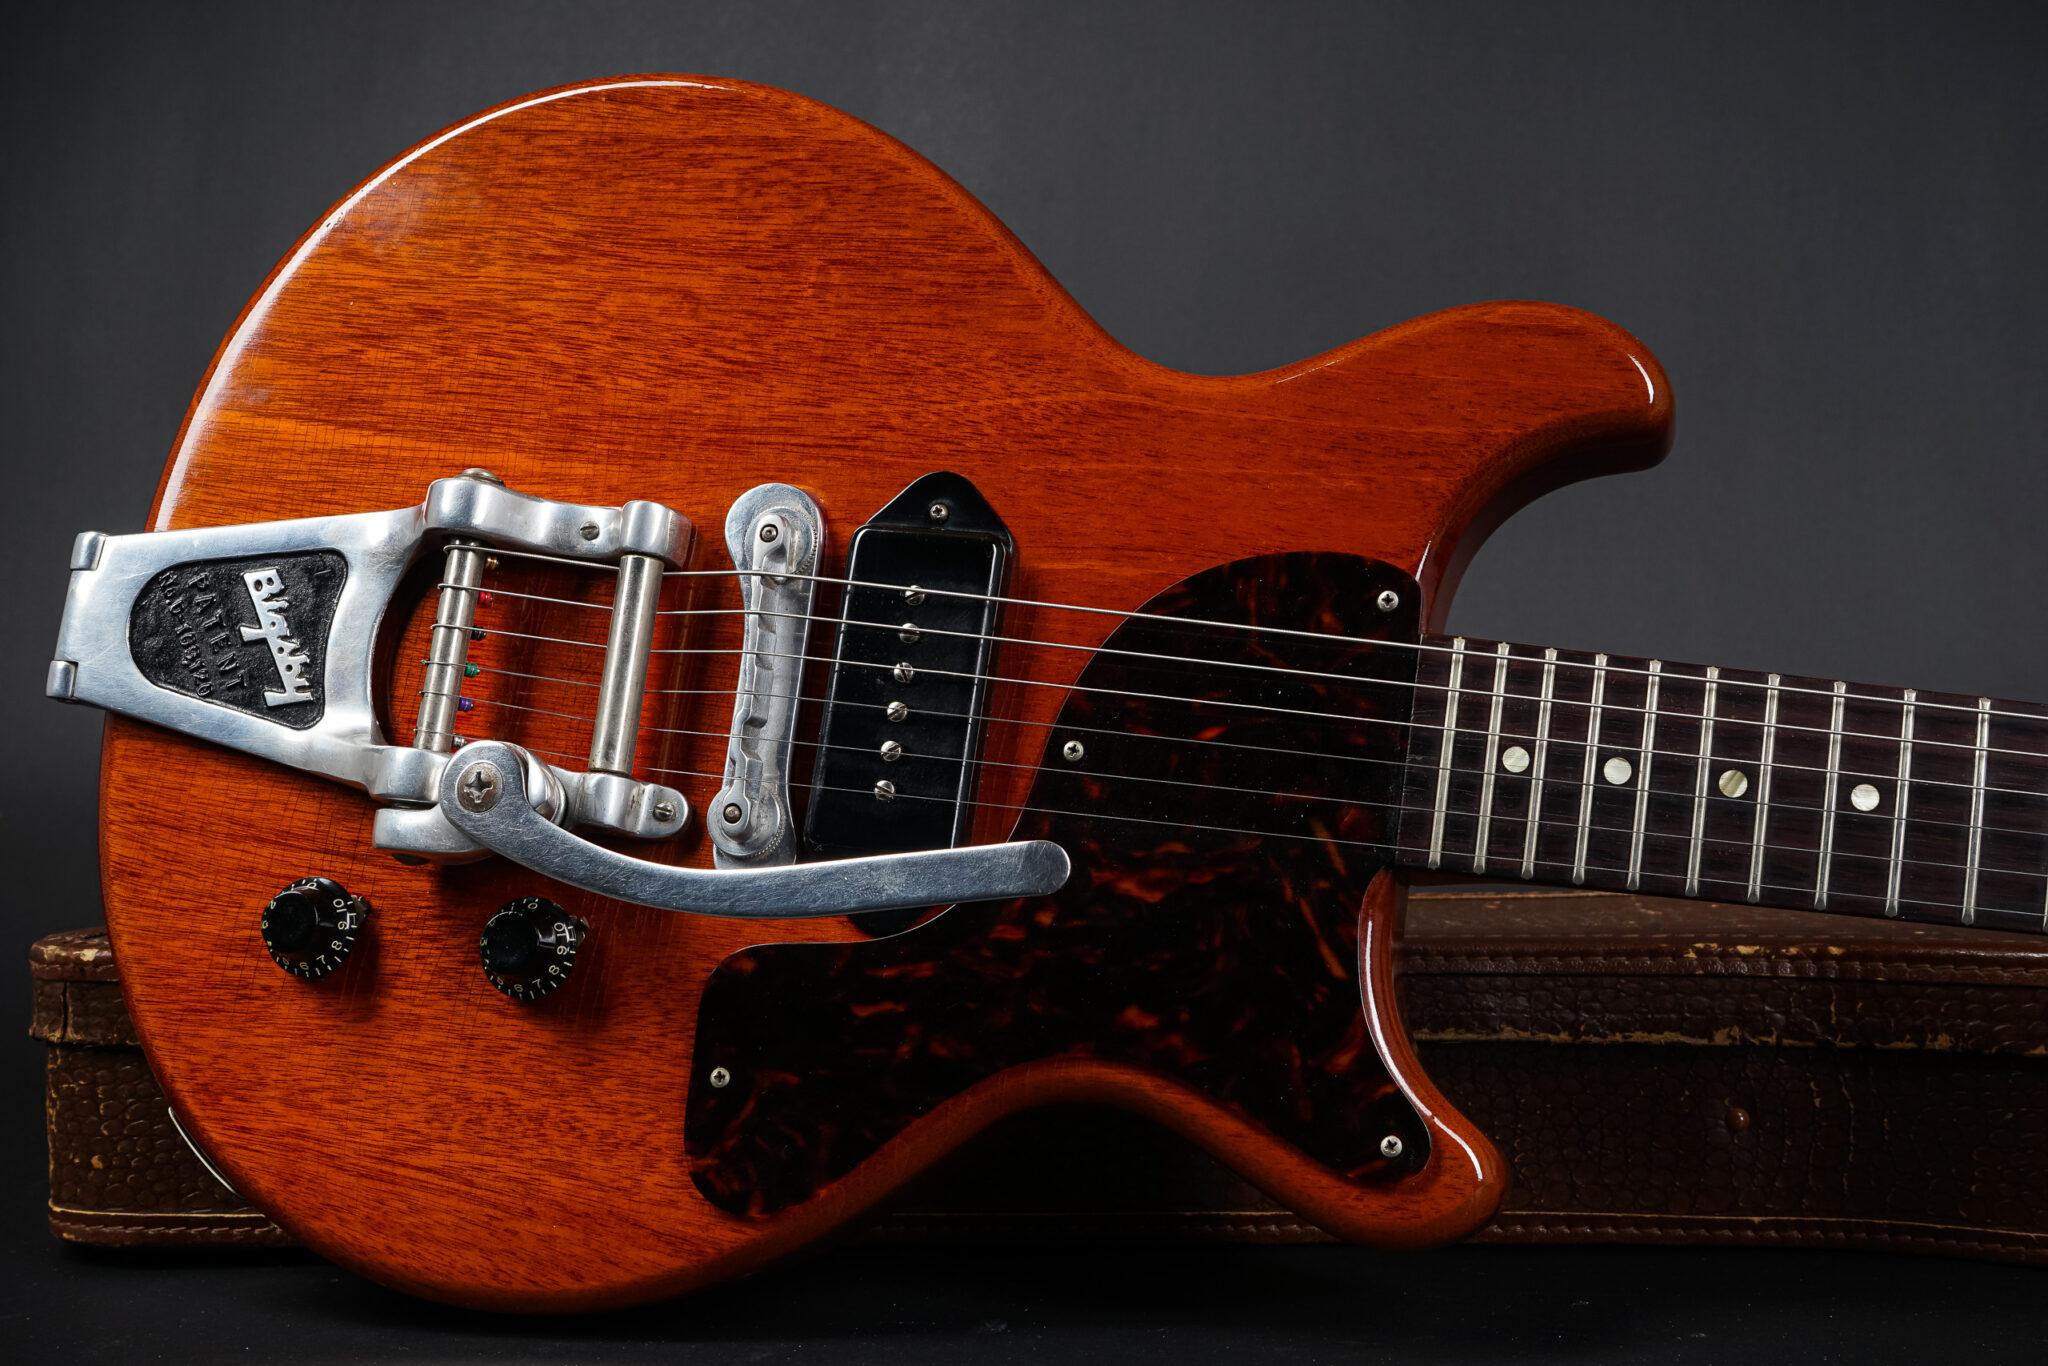 https://guitarpoint.de/app/uploads/products/1960-gibson-les-paul-junior-dc-cherry-rare-factory-bigsby/1960-Gibson-Les-Paul-Junior-03910-10-2048x1366.jpg